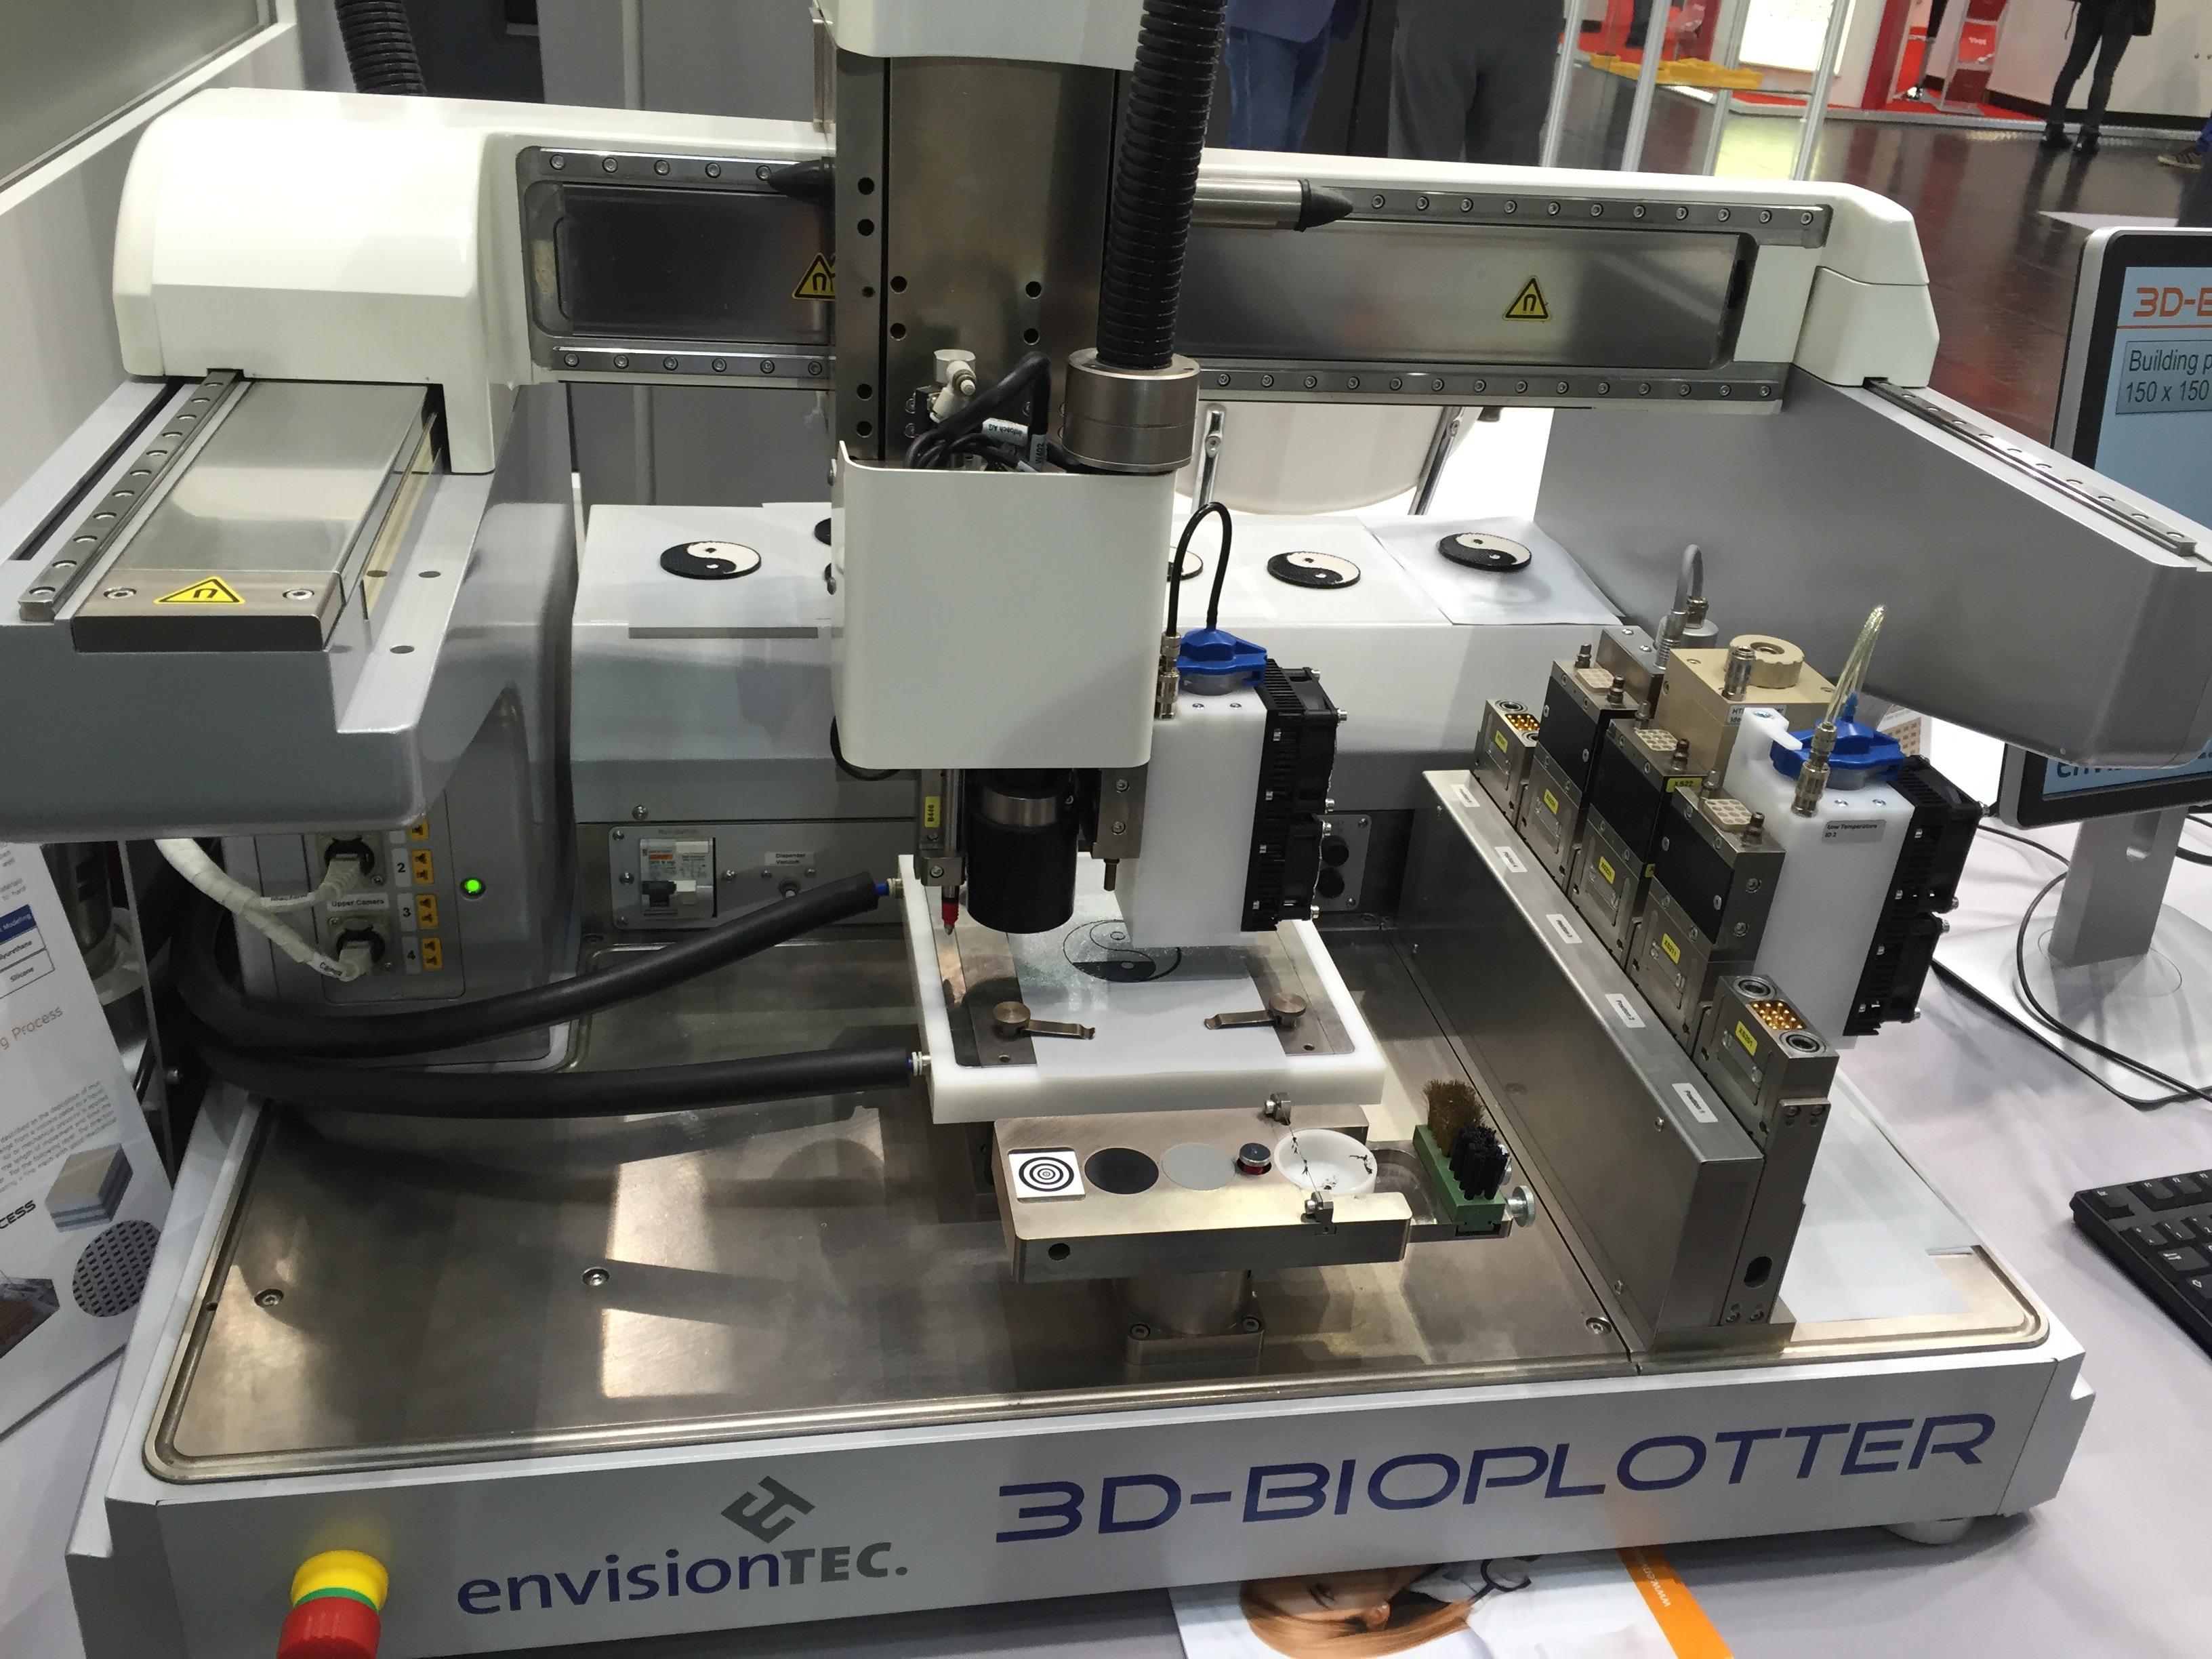 bioplotter